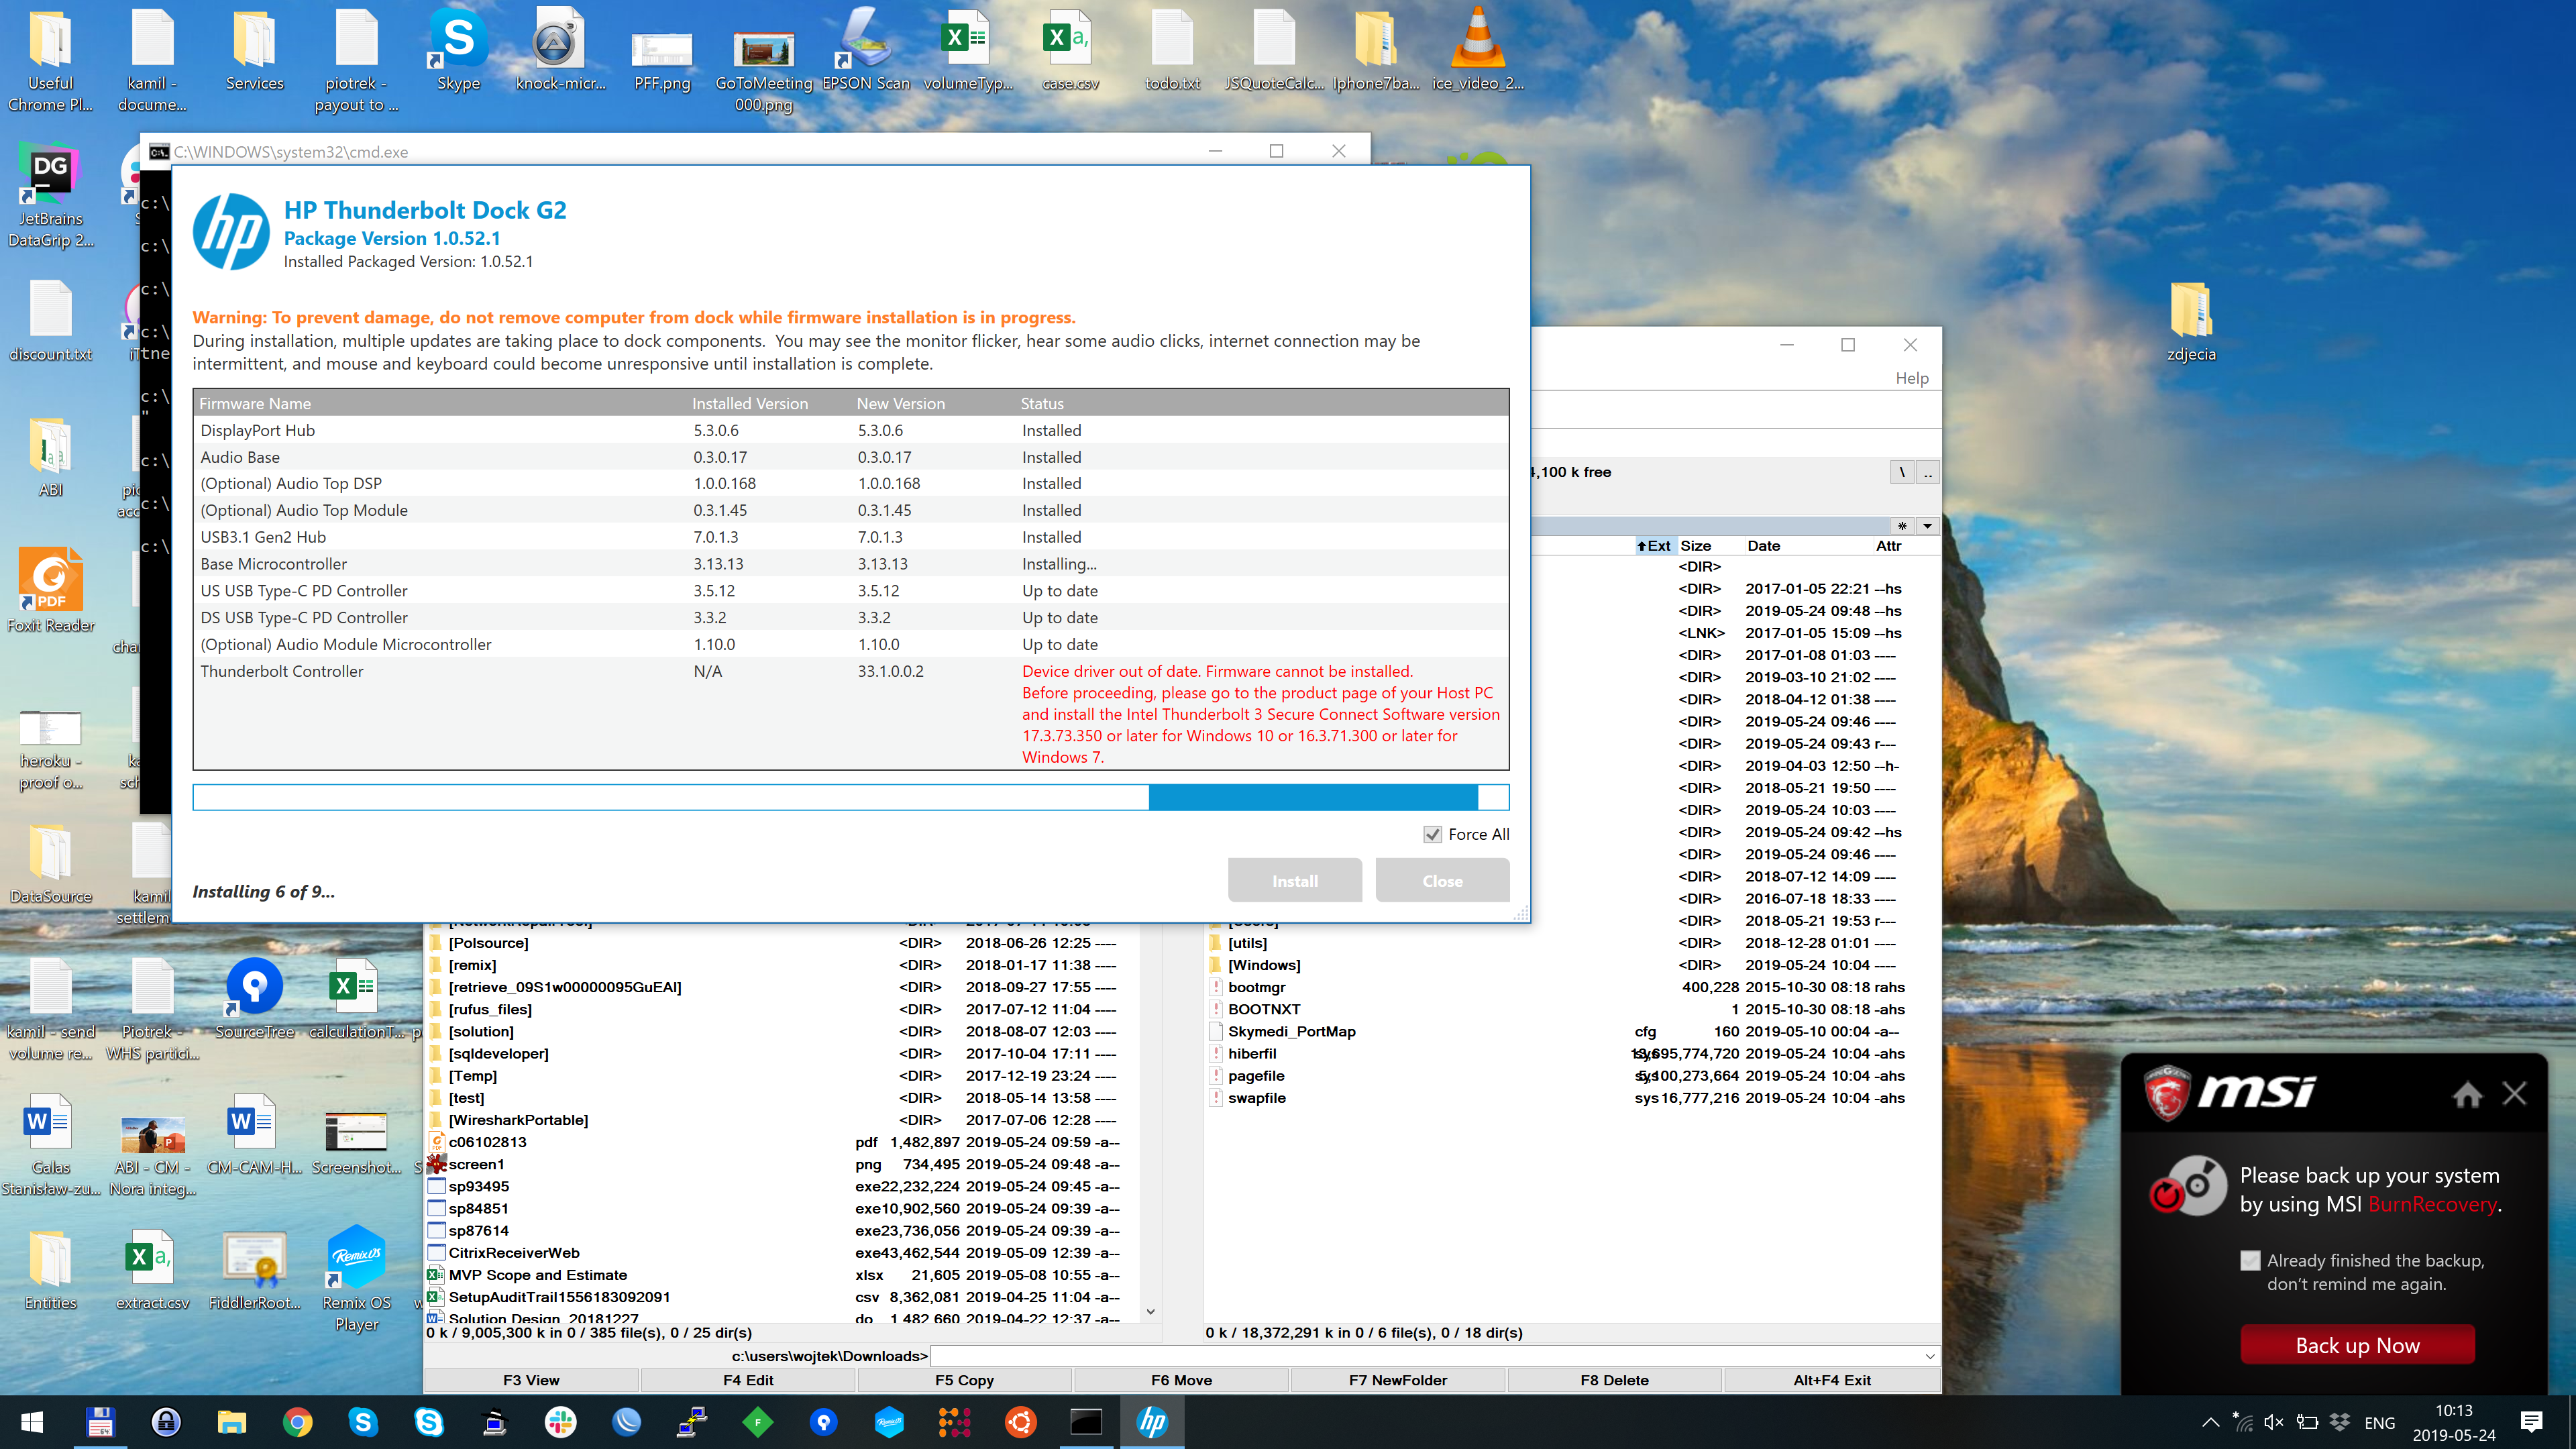 skycontroller firmware update 1.2.3